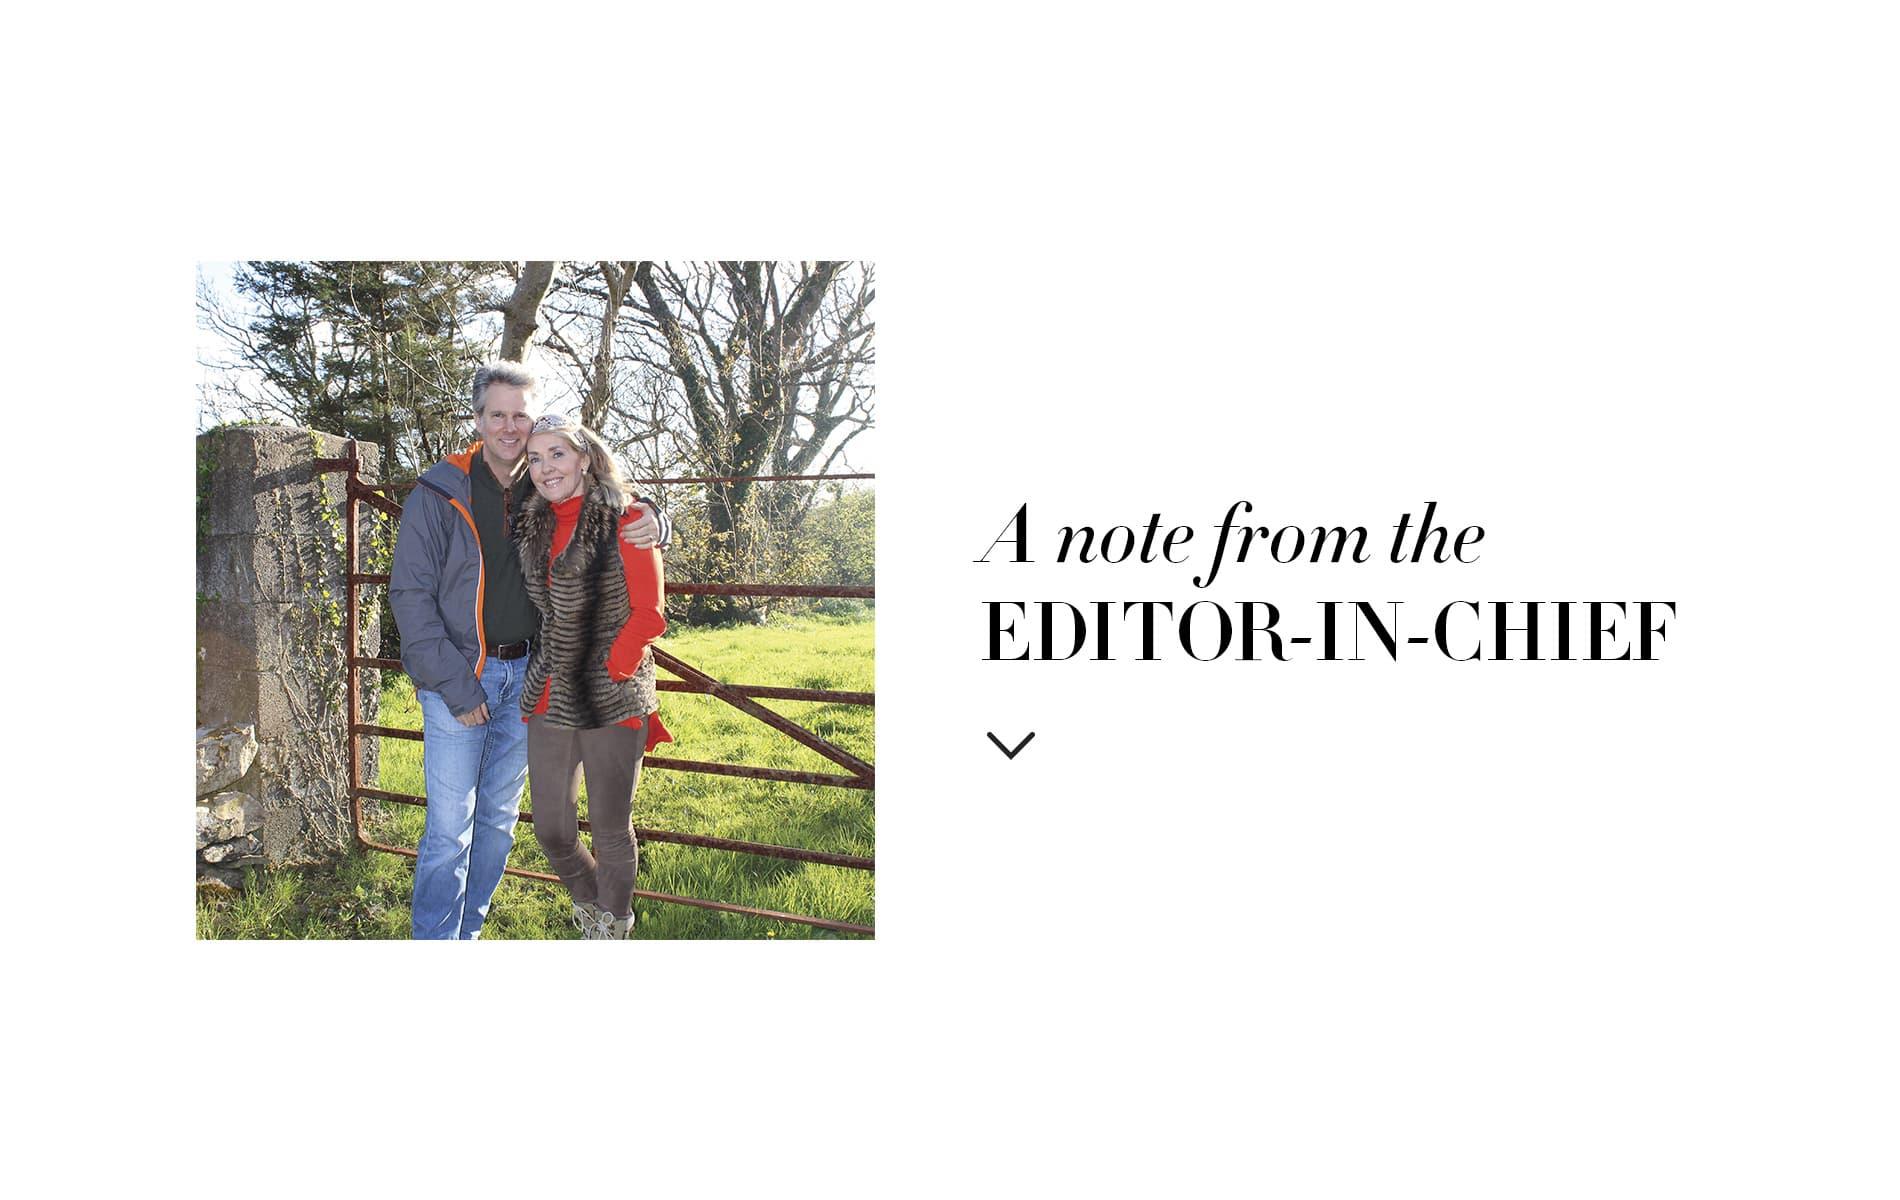 VIE Magazine January 2020 Travel Issue, Lisa Marie Burwell, Lisa Burwell Editor in Chief Note